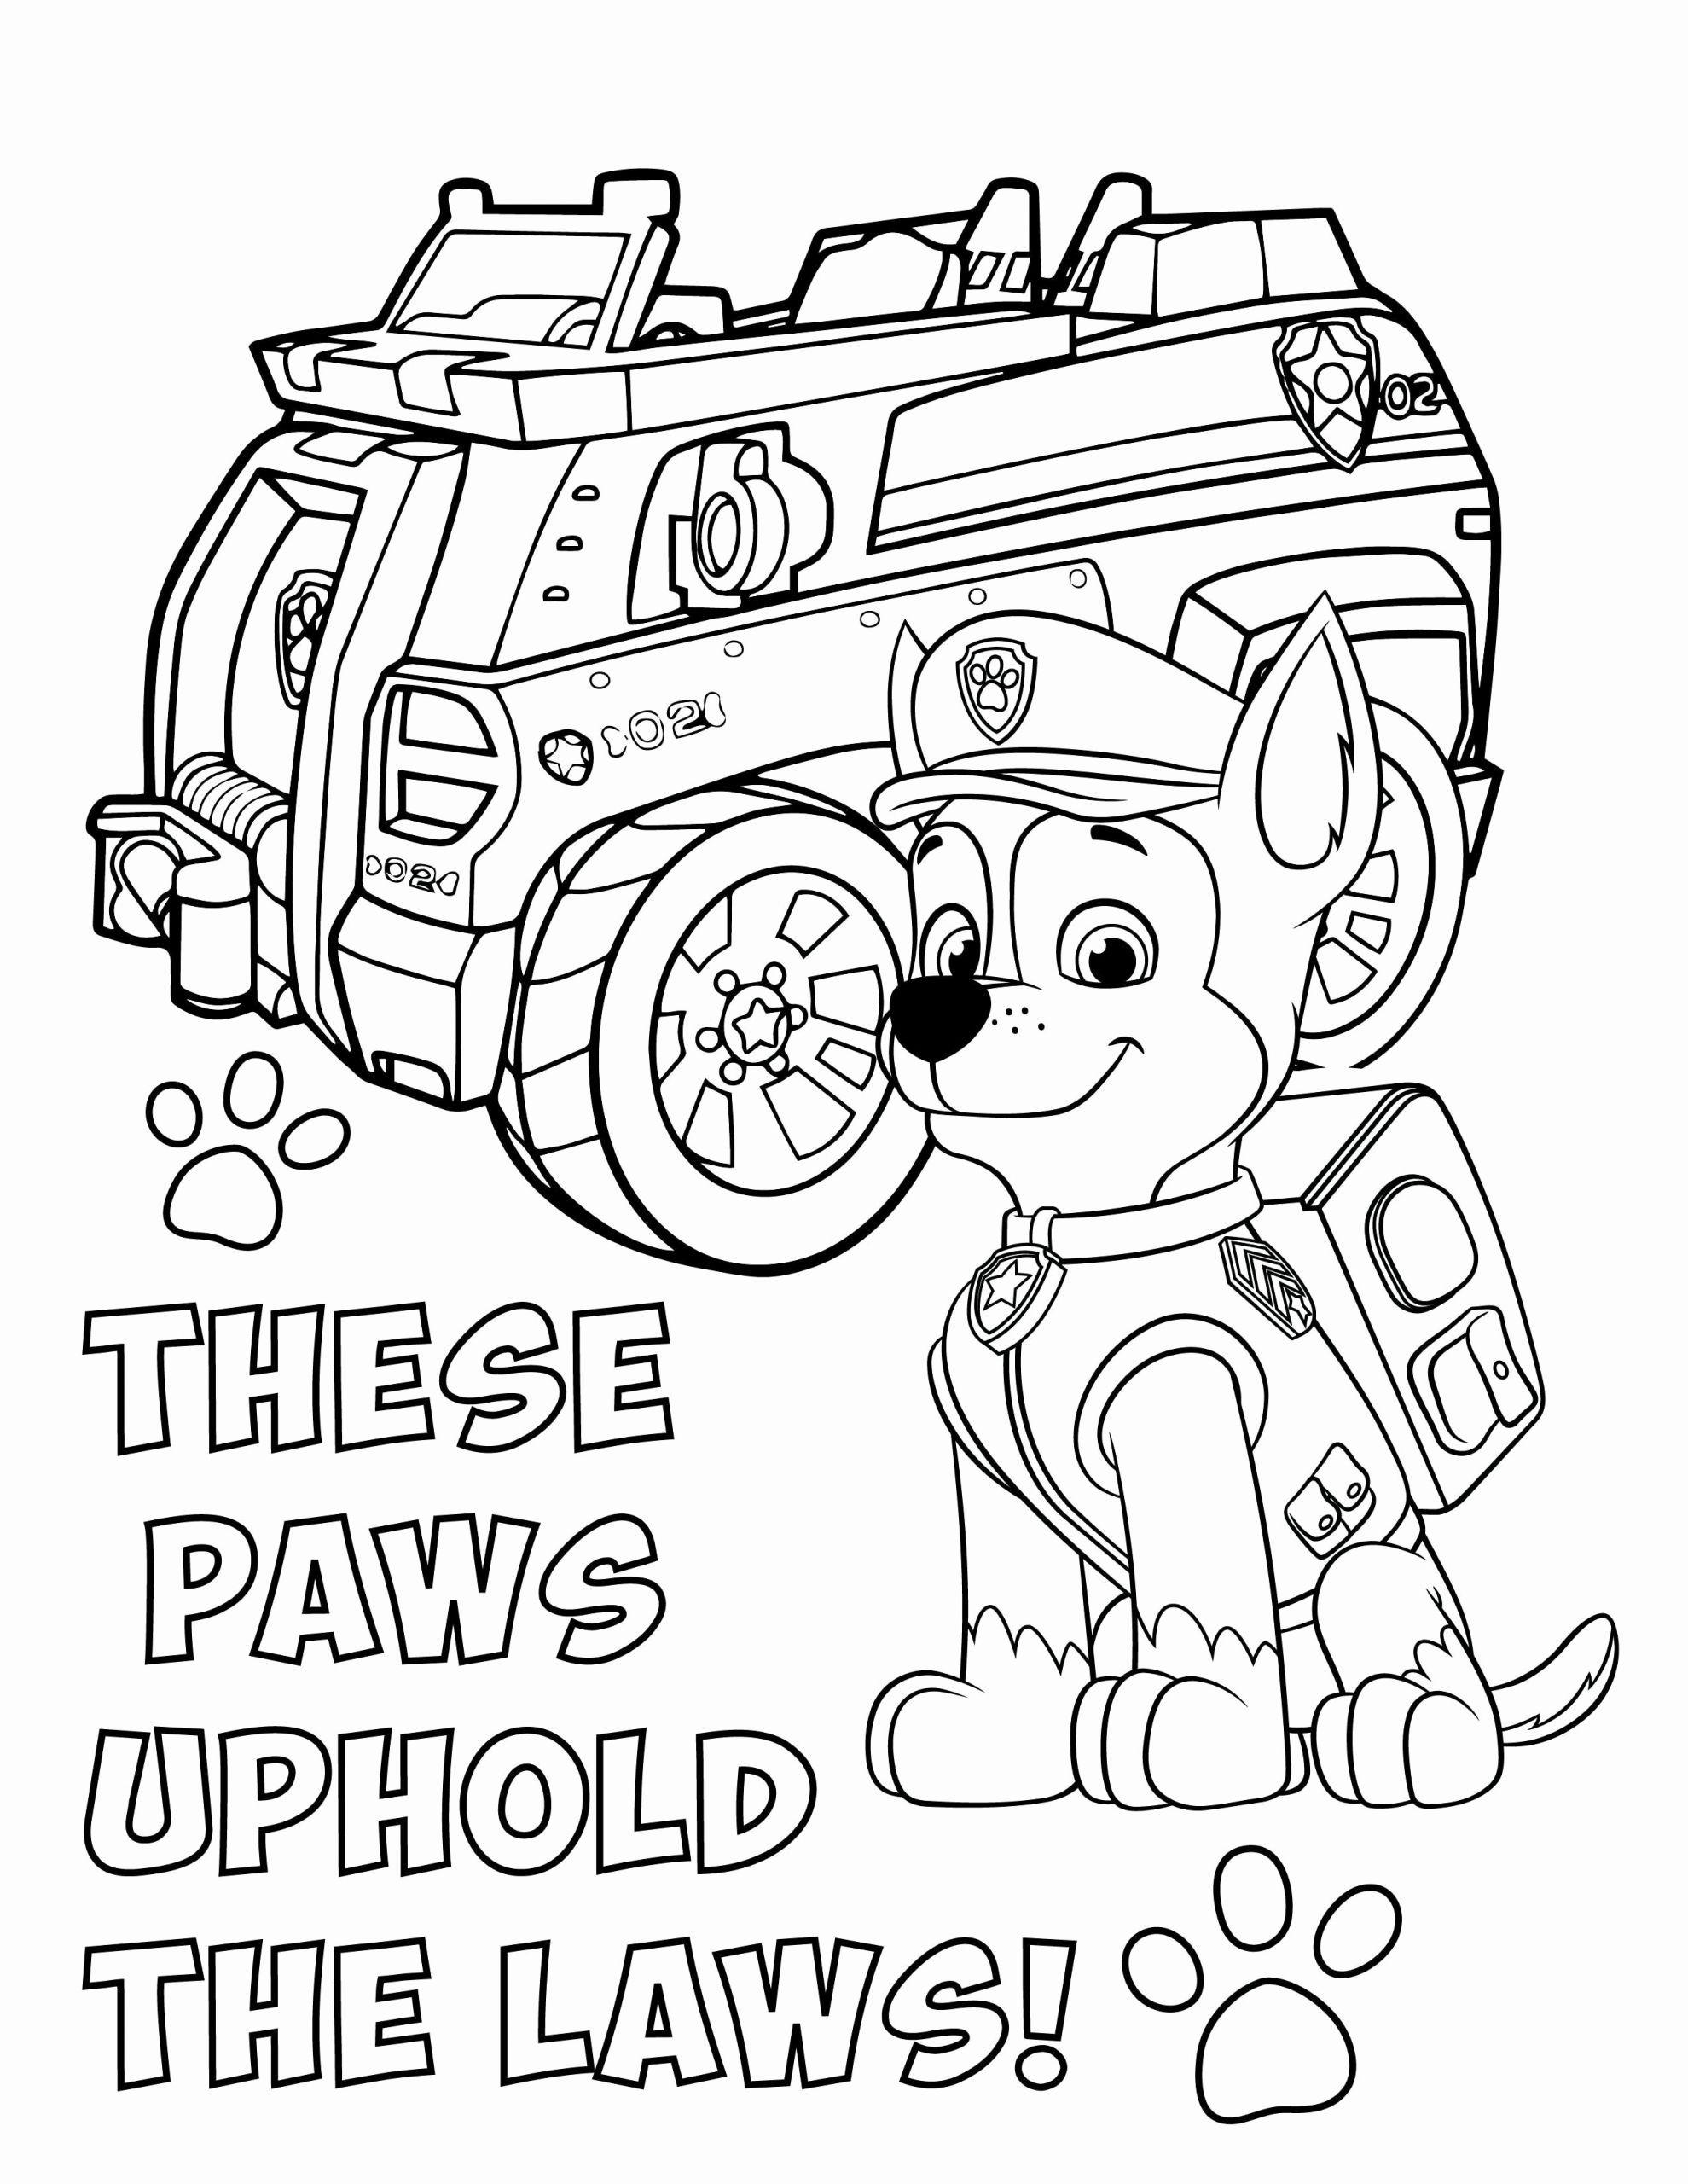 Pin By Oranit Ruankum On Desenhos Paw Patrol Coloring Pages Paw Patrol Coloring Chase Paw Patrol